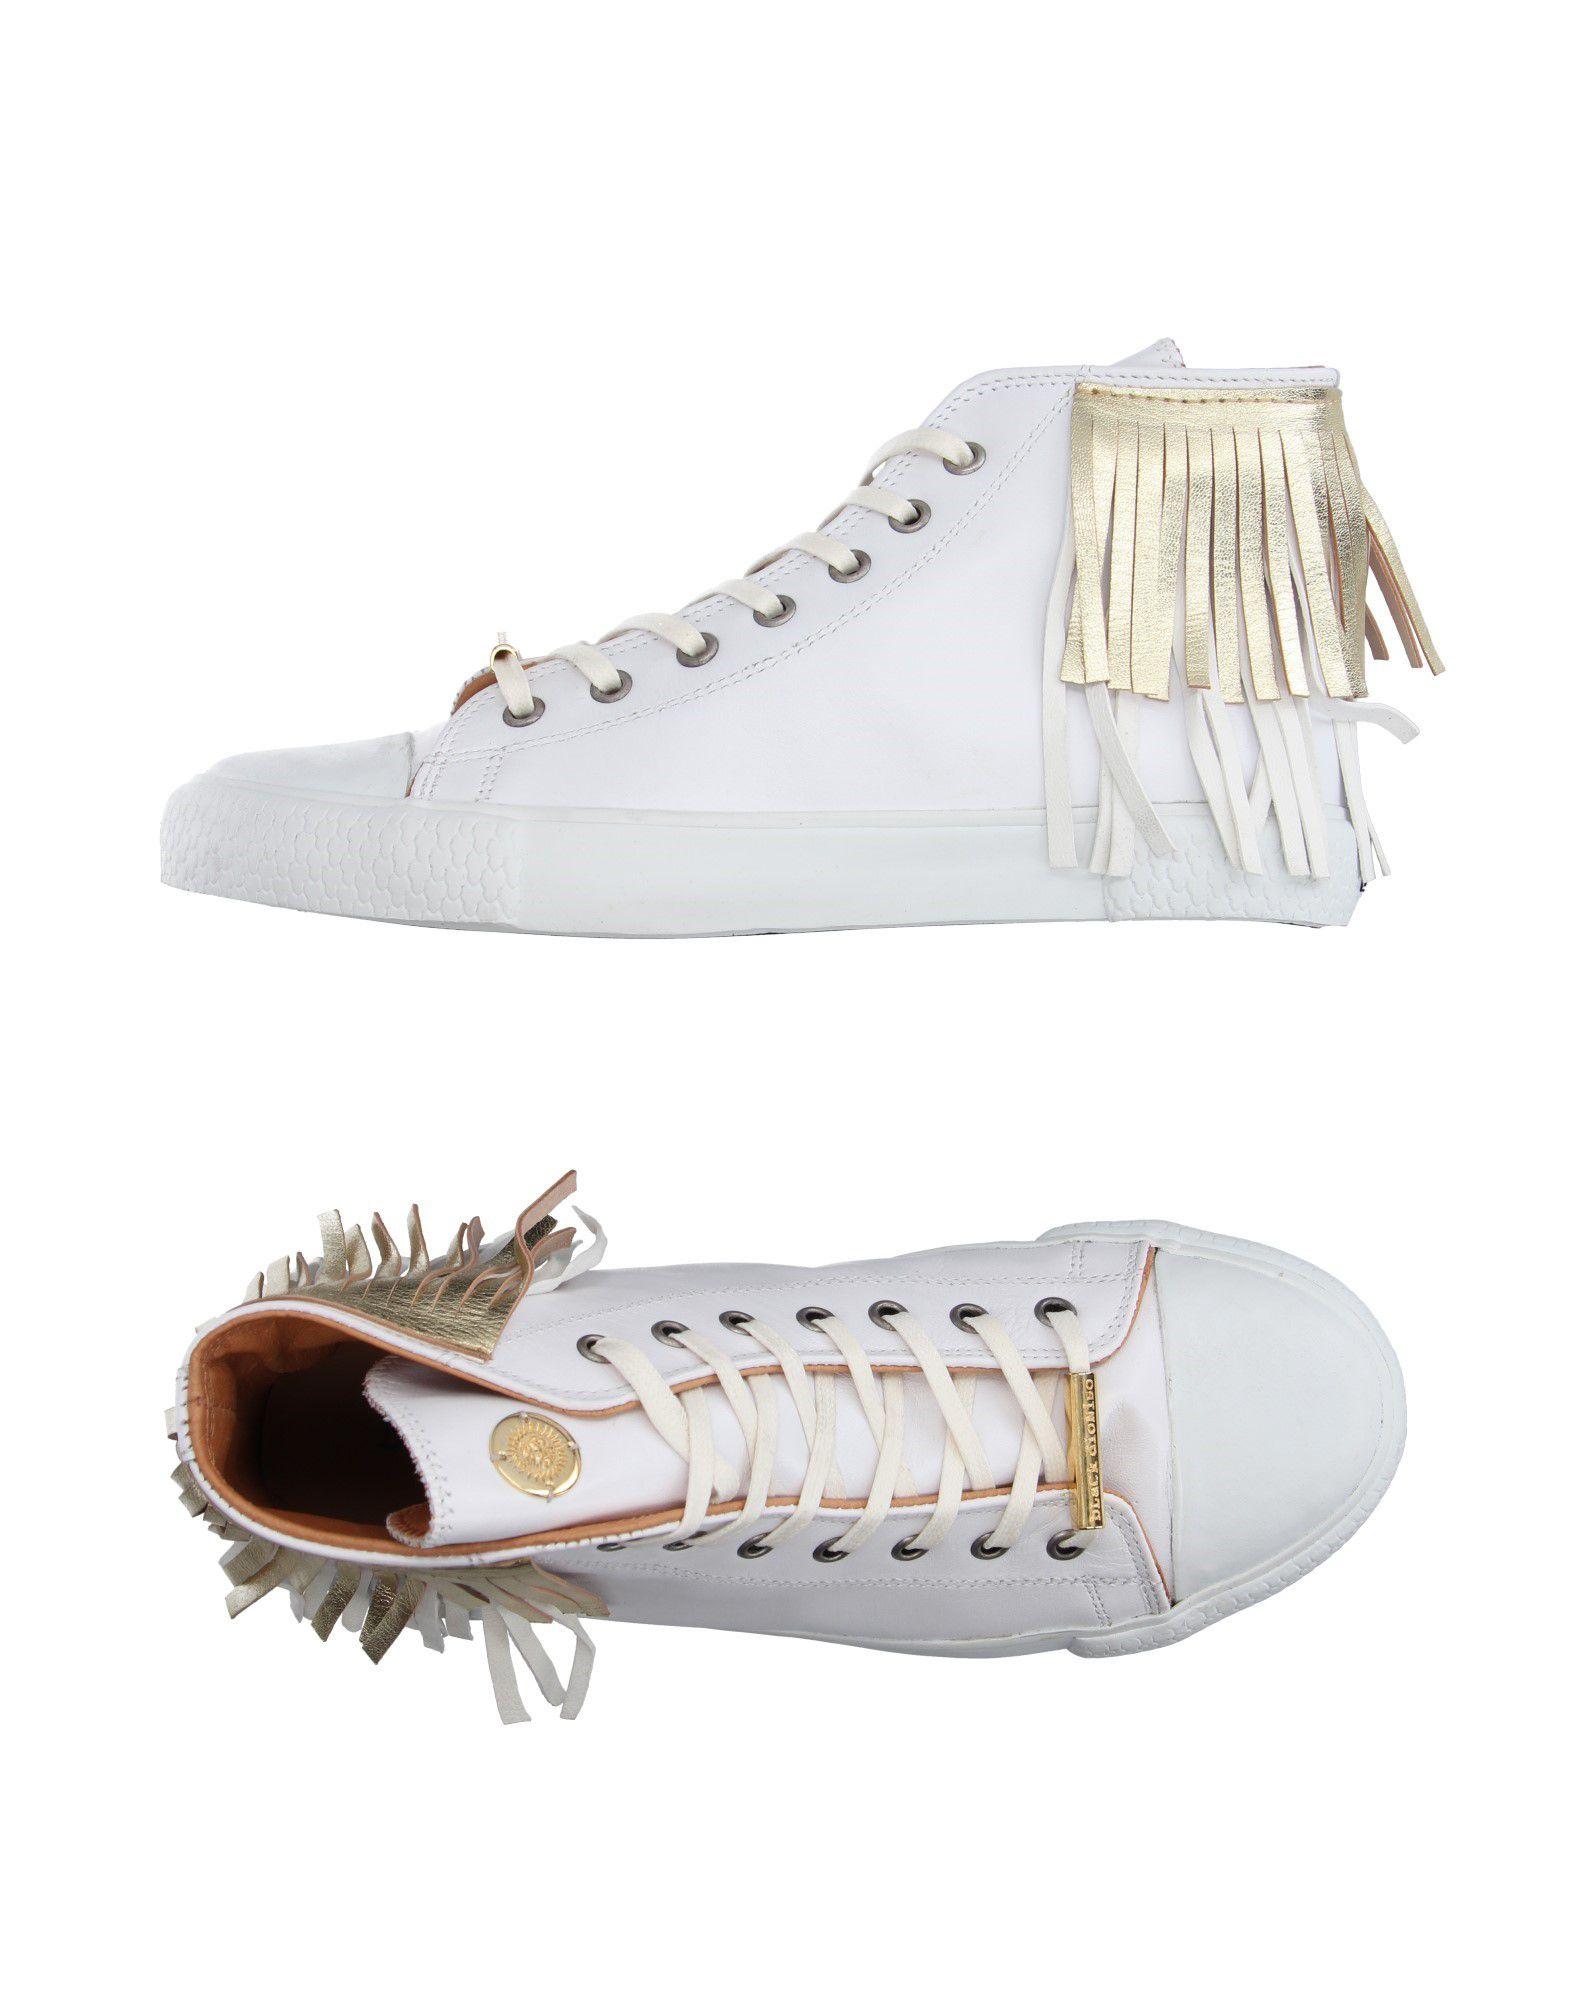 BLACK DIONISO Высокие кеды и кроссовки кеды кроссовки высокие dc evan hi zero black white